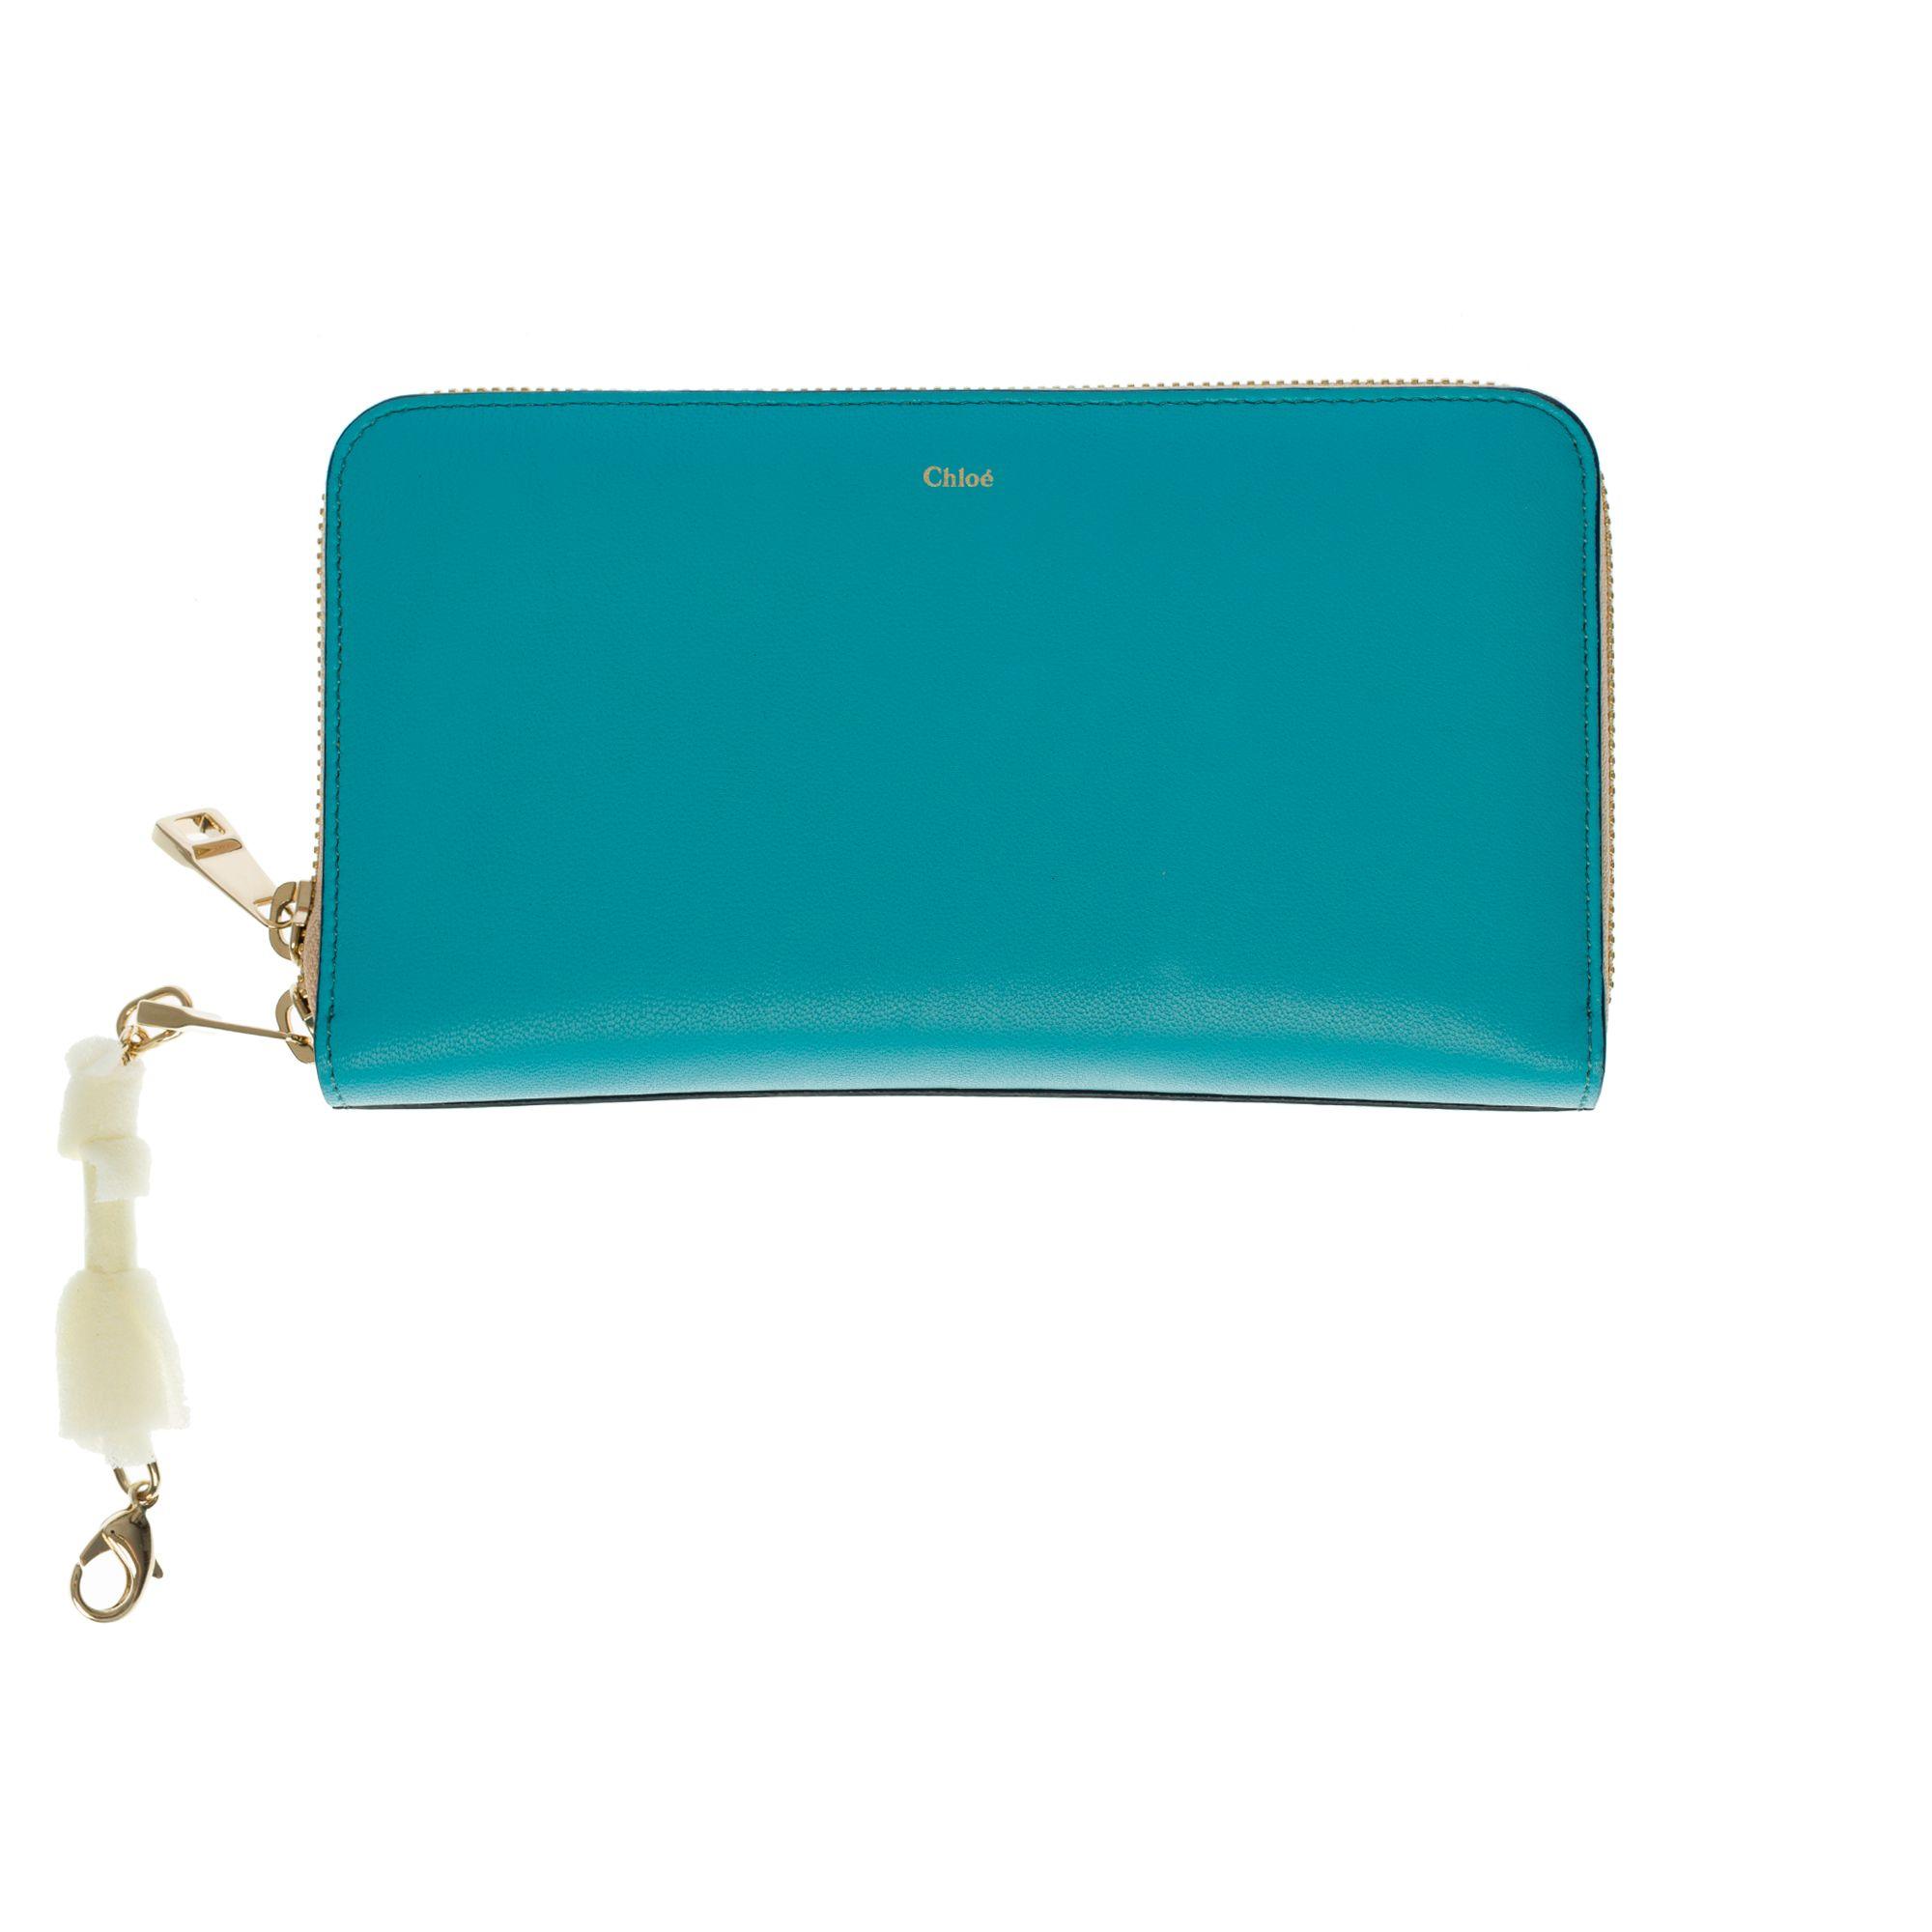 Portefeuille CHLOÉ Bleu, bleu marine, bleu turquoise